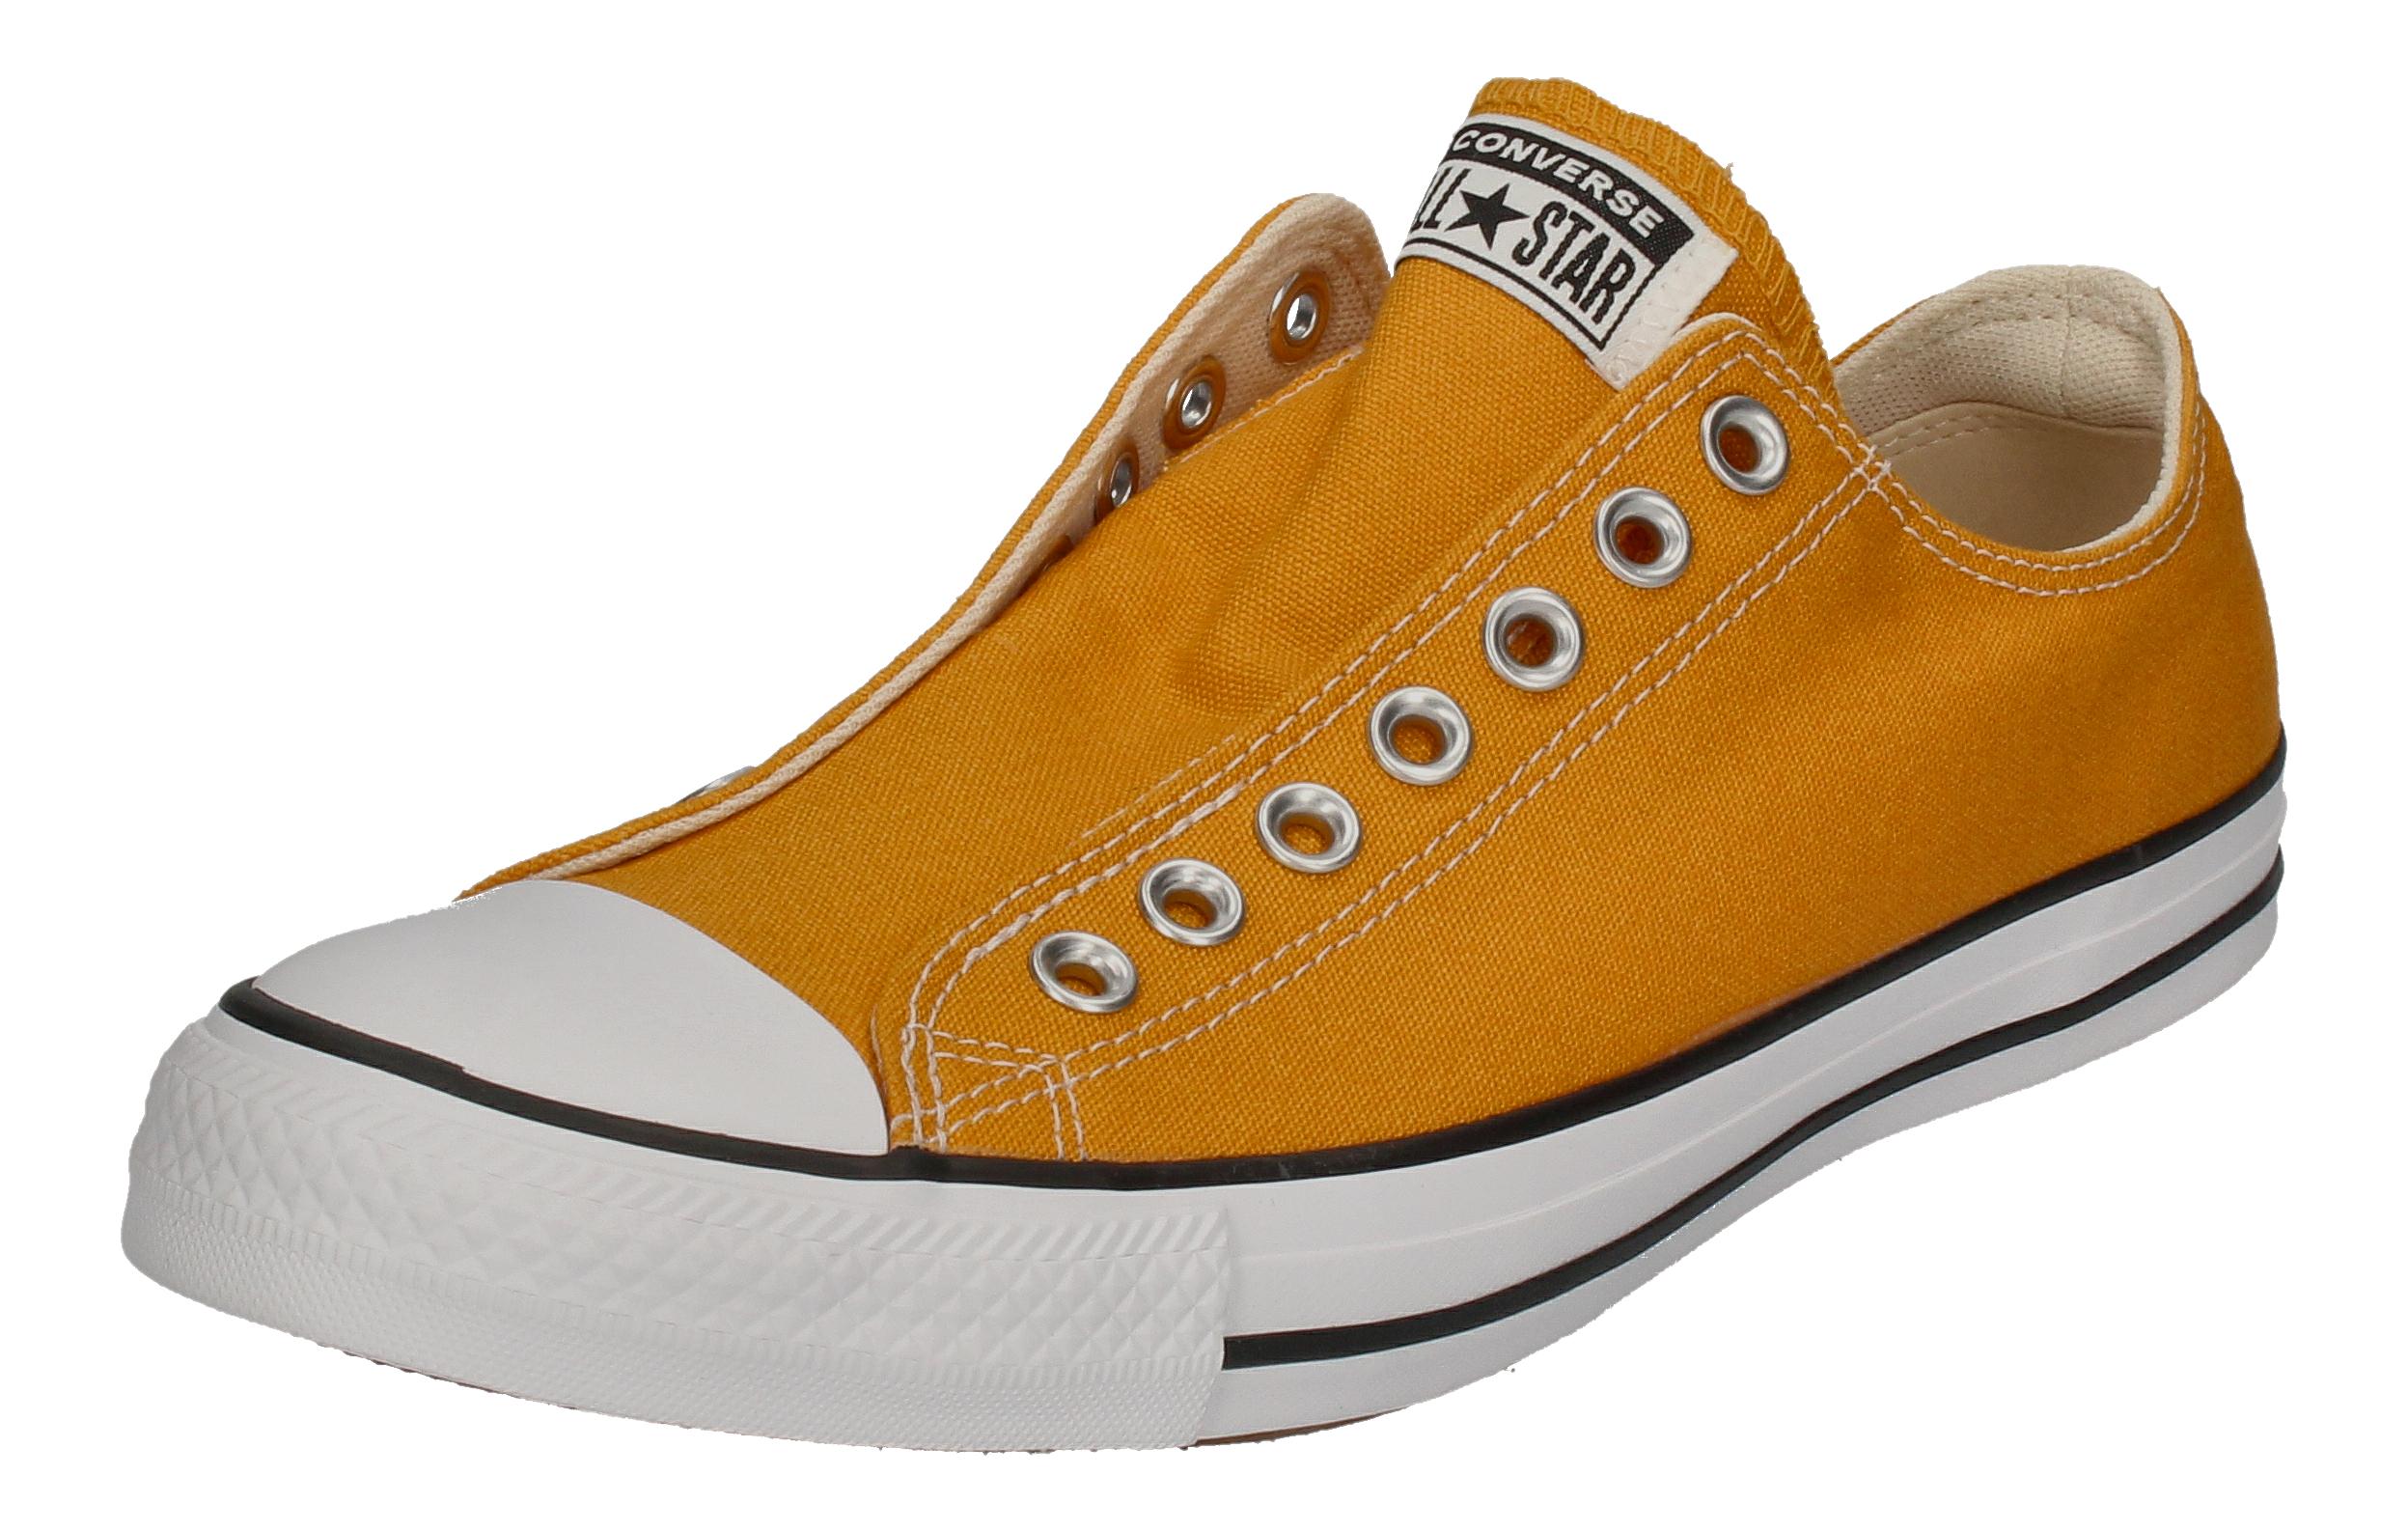 CONVERSE Sneakers - Slip on CTAS SLIP 166768C sunflower_1